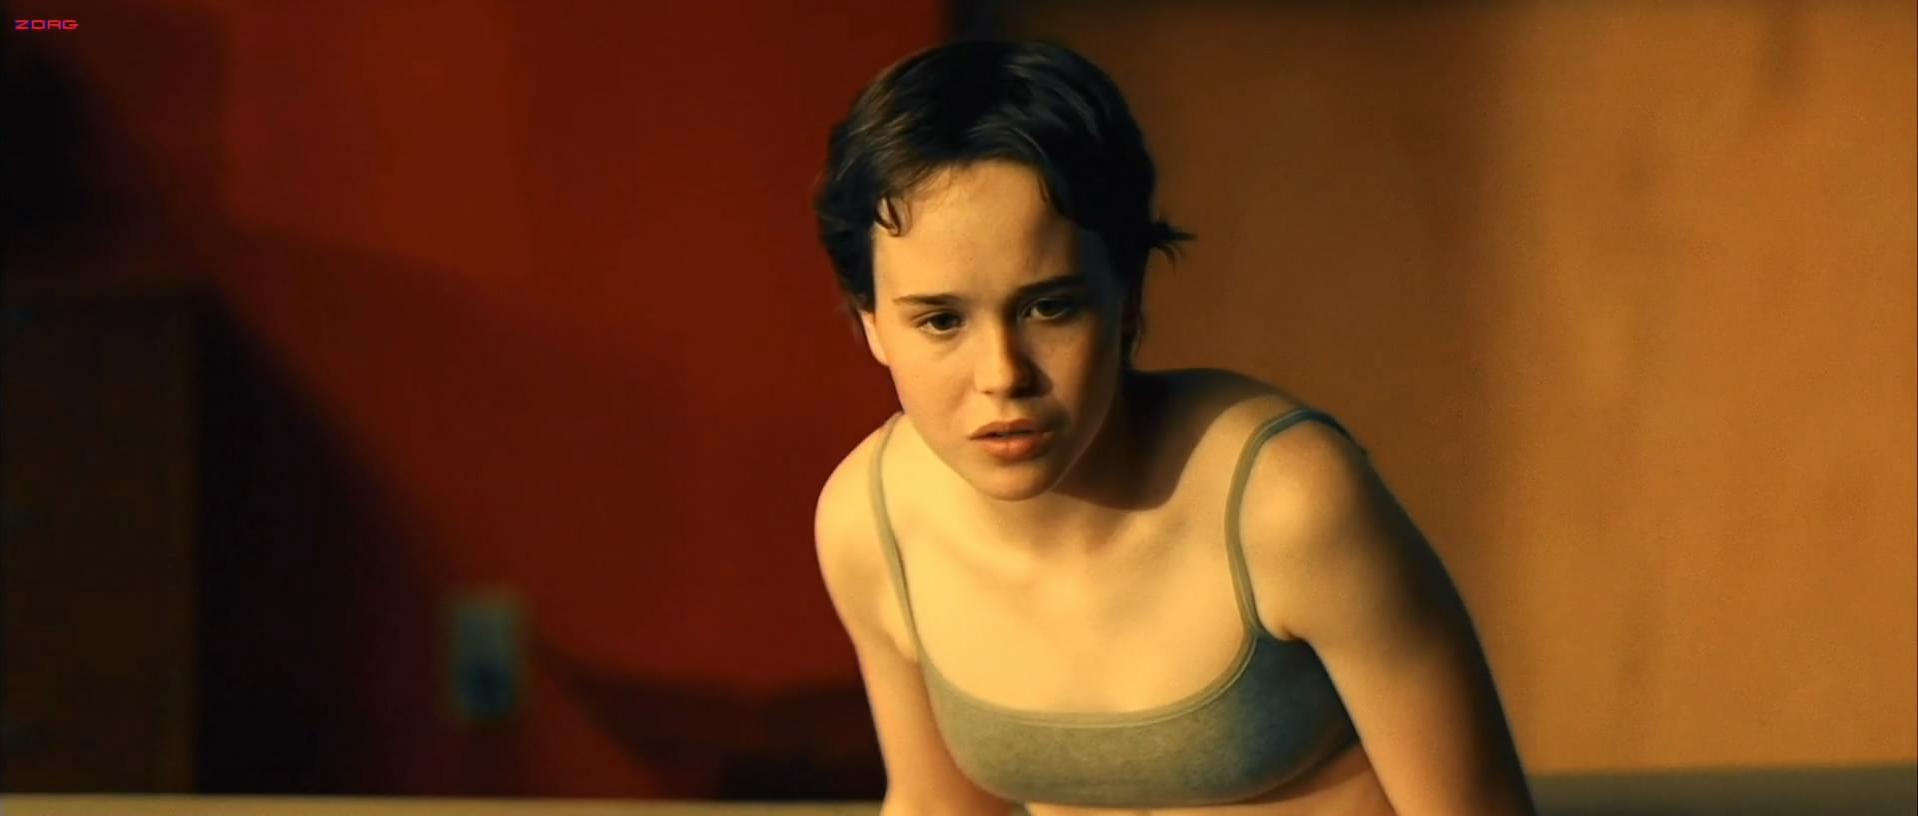 Ellen Page sexy - Hard Candy (2005)